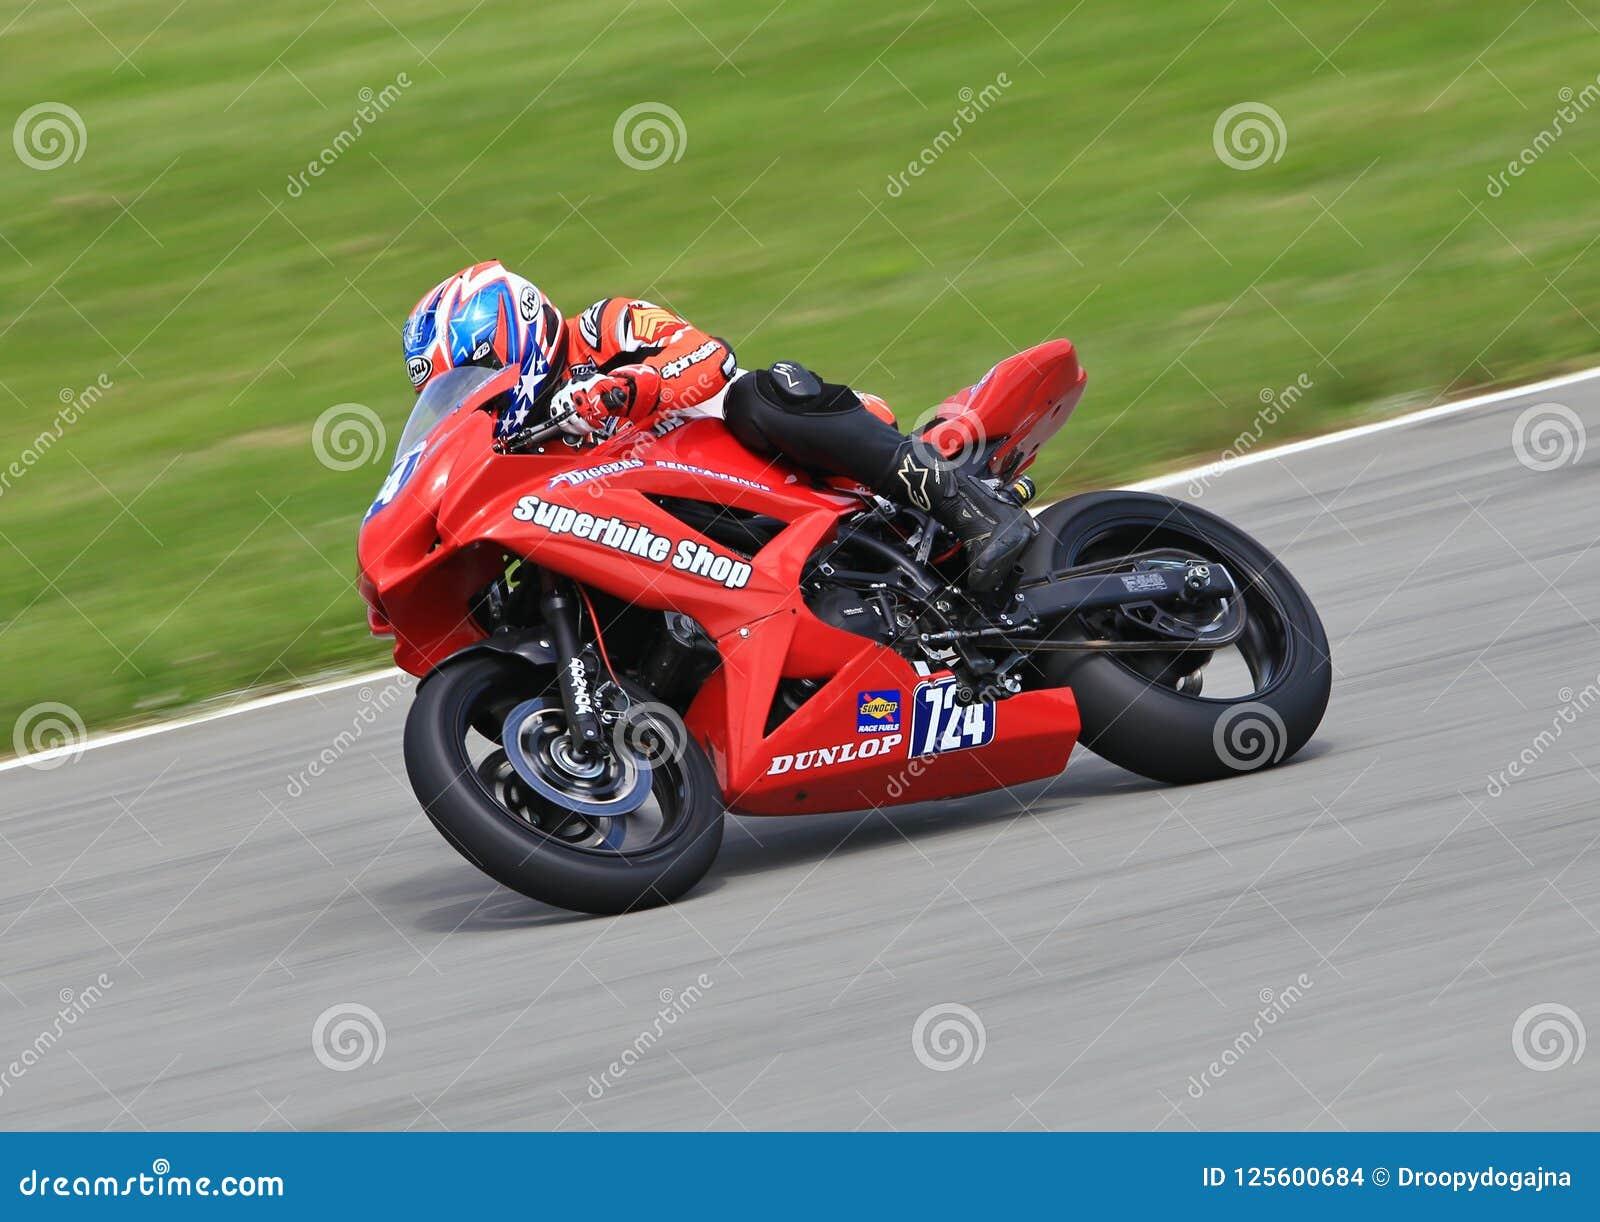 Motoamerica Motorcycle Racing At Motogp Editorial Stock Image